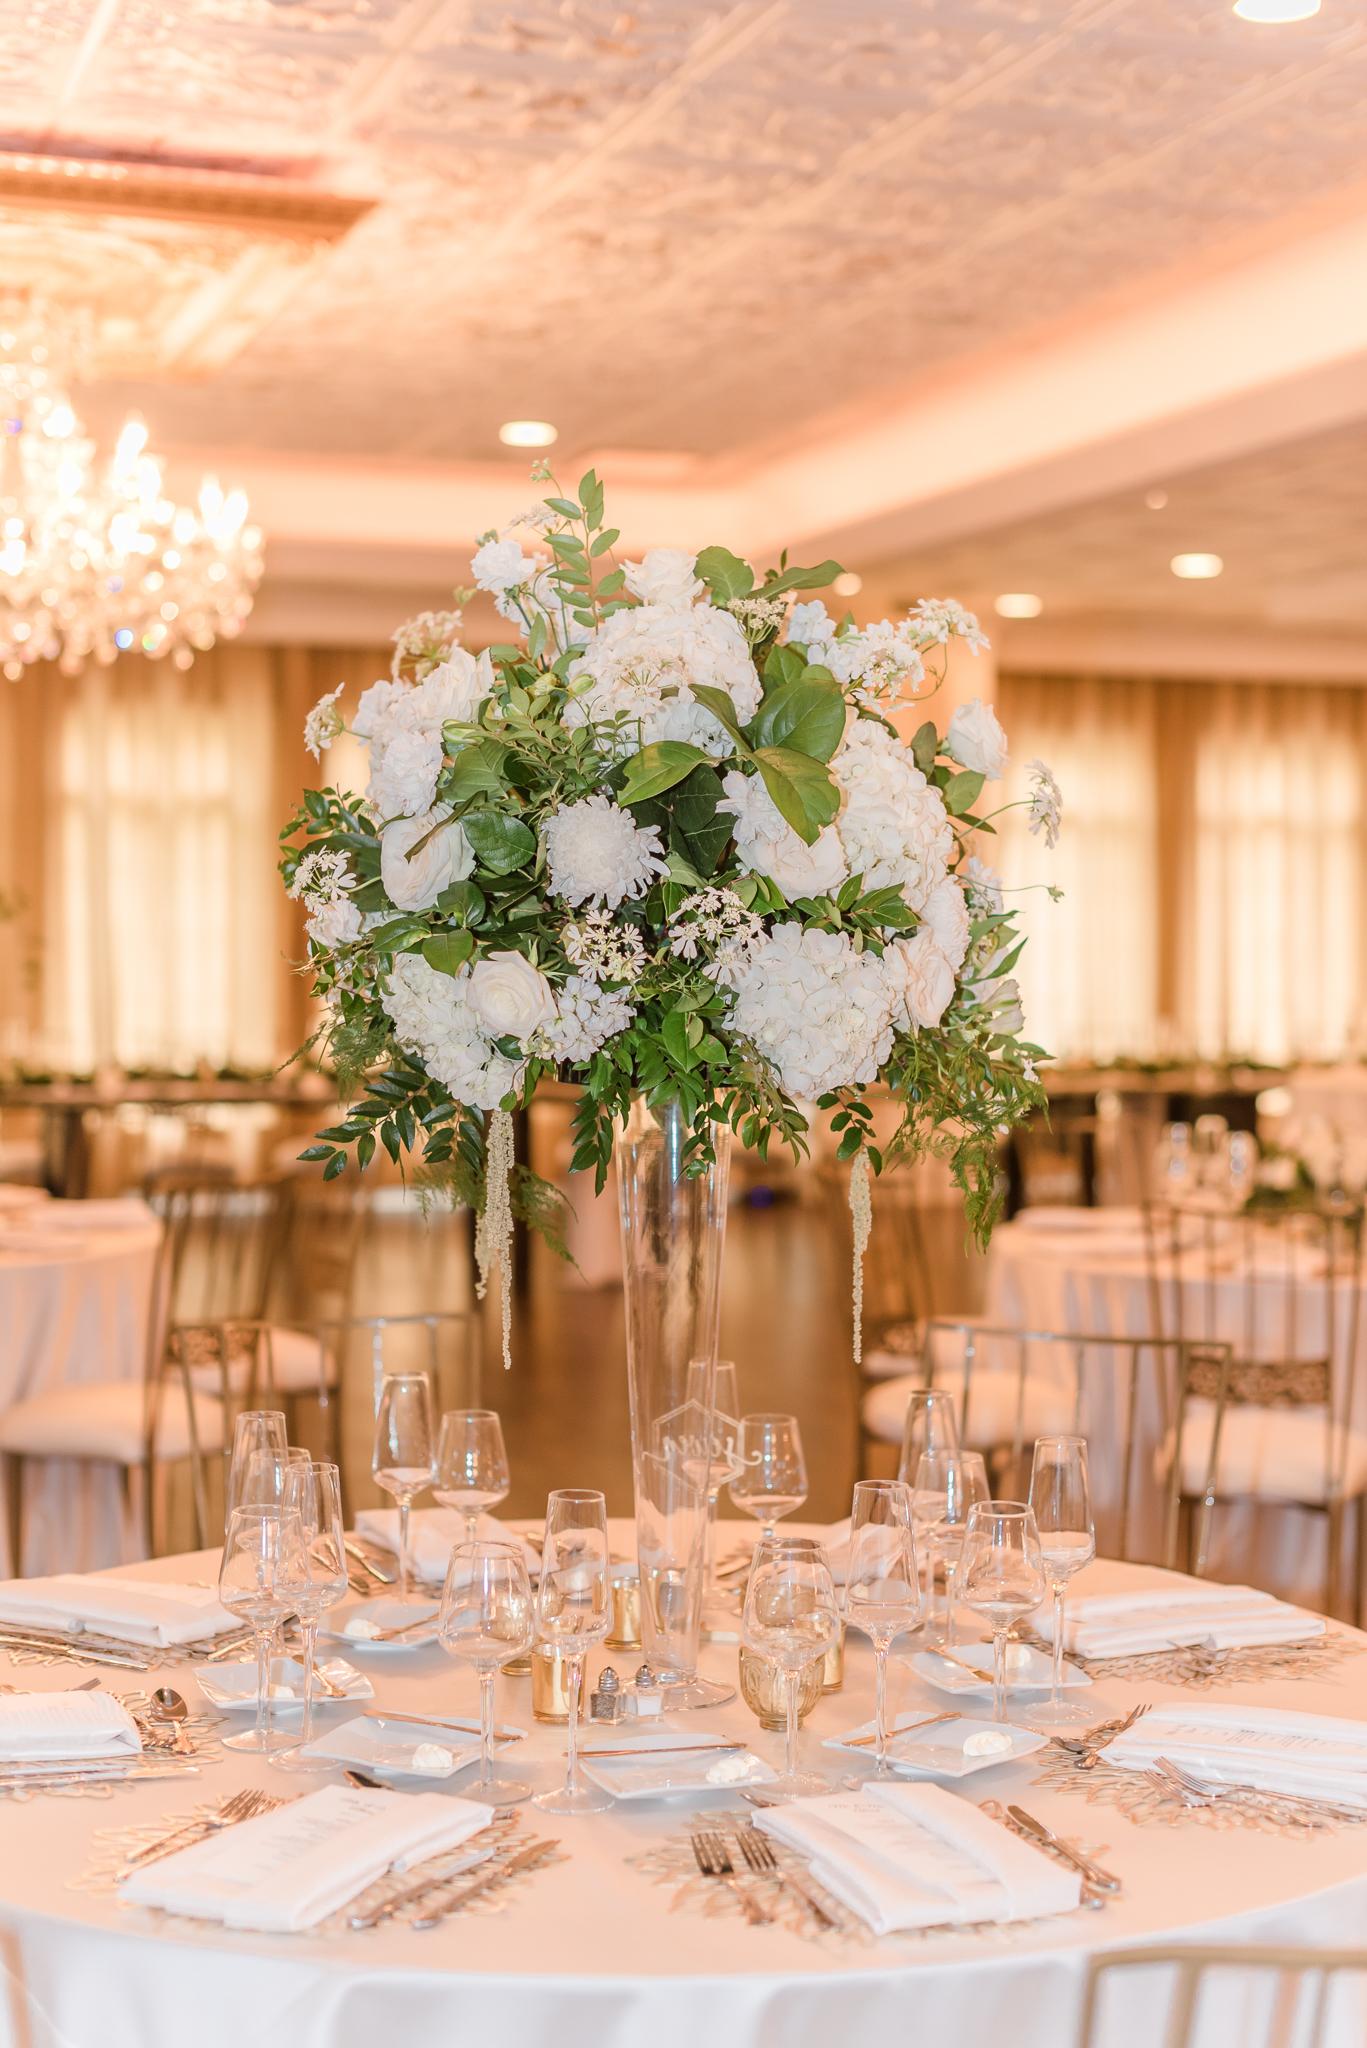 Black Iris Estate Wedding Elegant White with Greenery Luxury High End Flowers-23.jpg